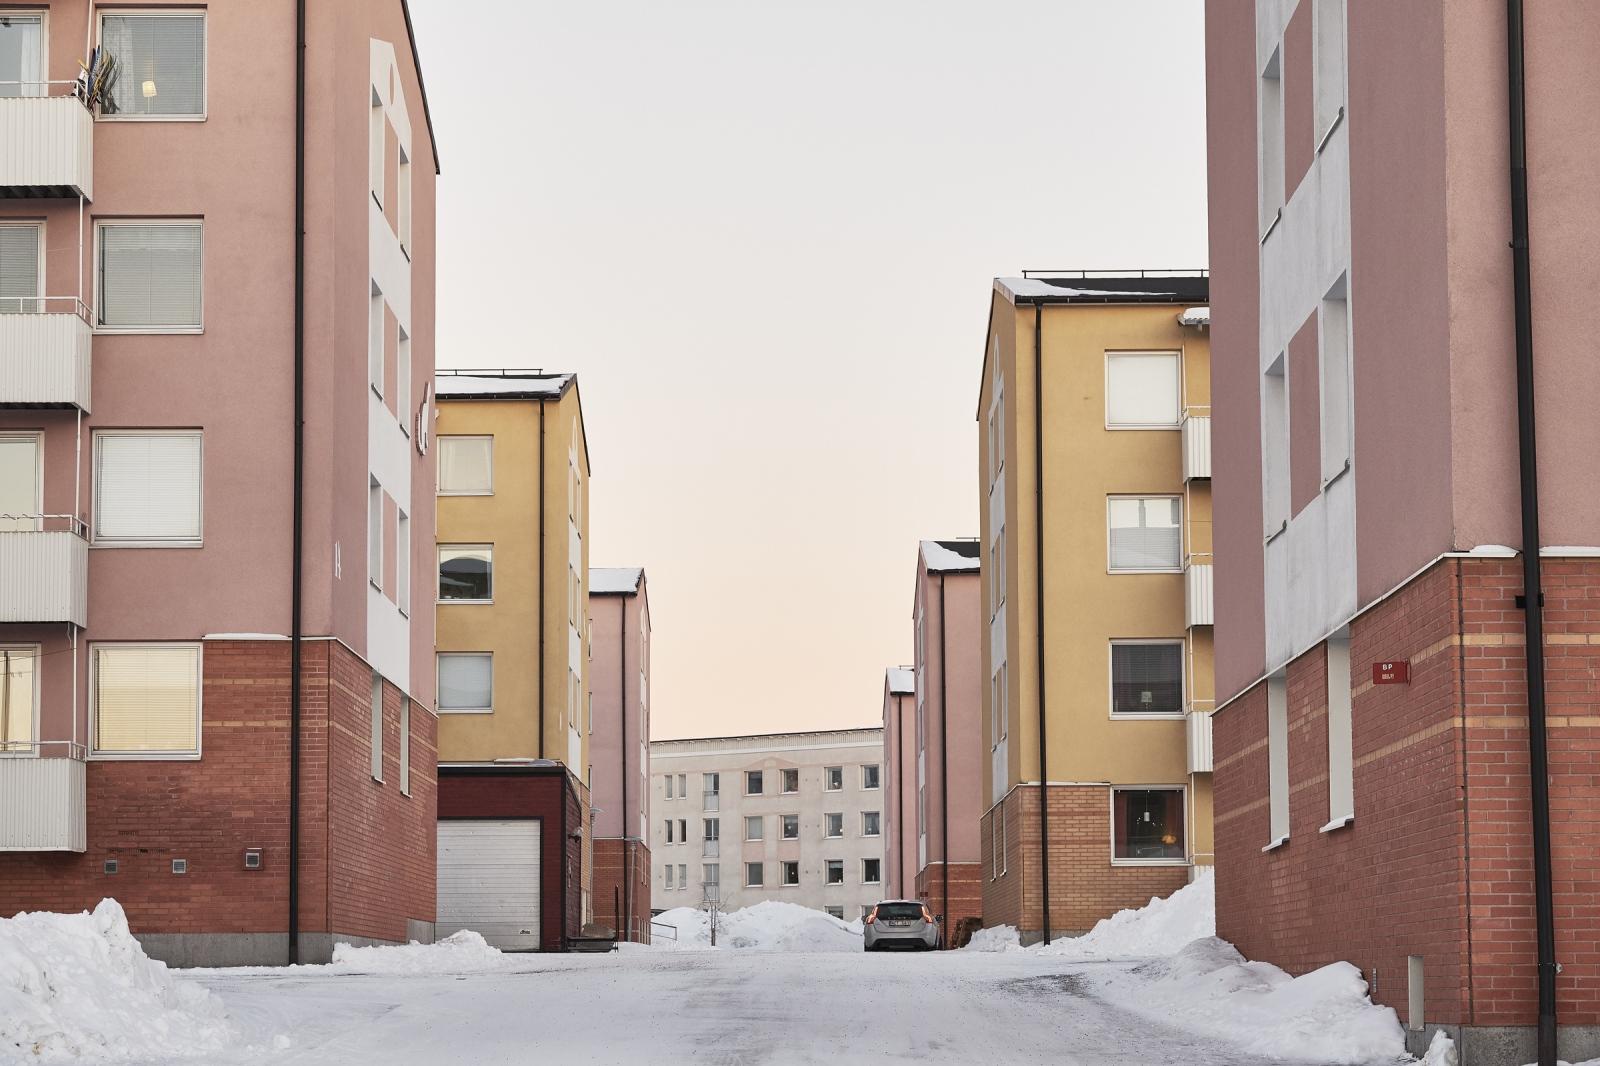 Photography image - Loading Kiruna_20170306_567_8Bit_2400px.jpg